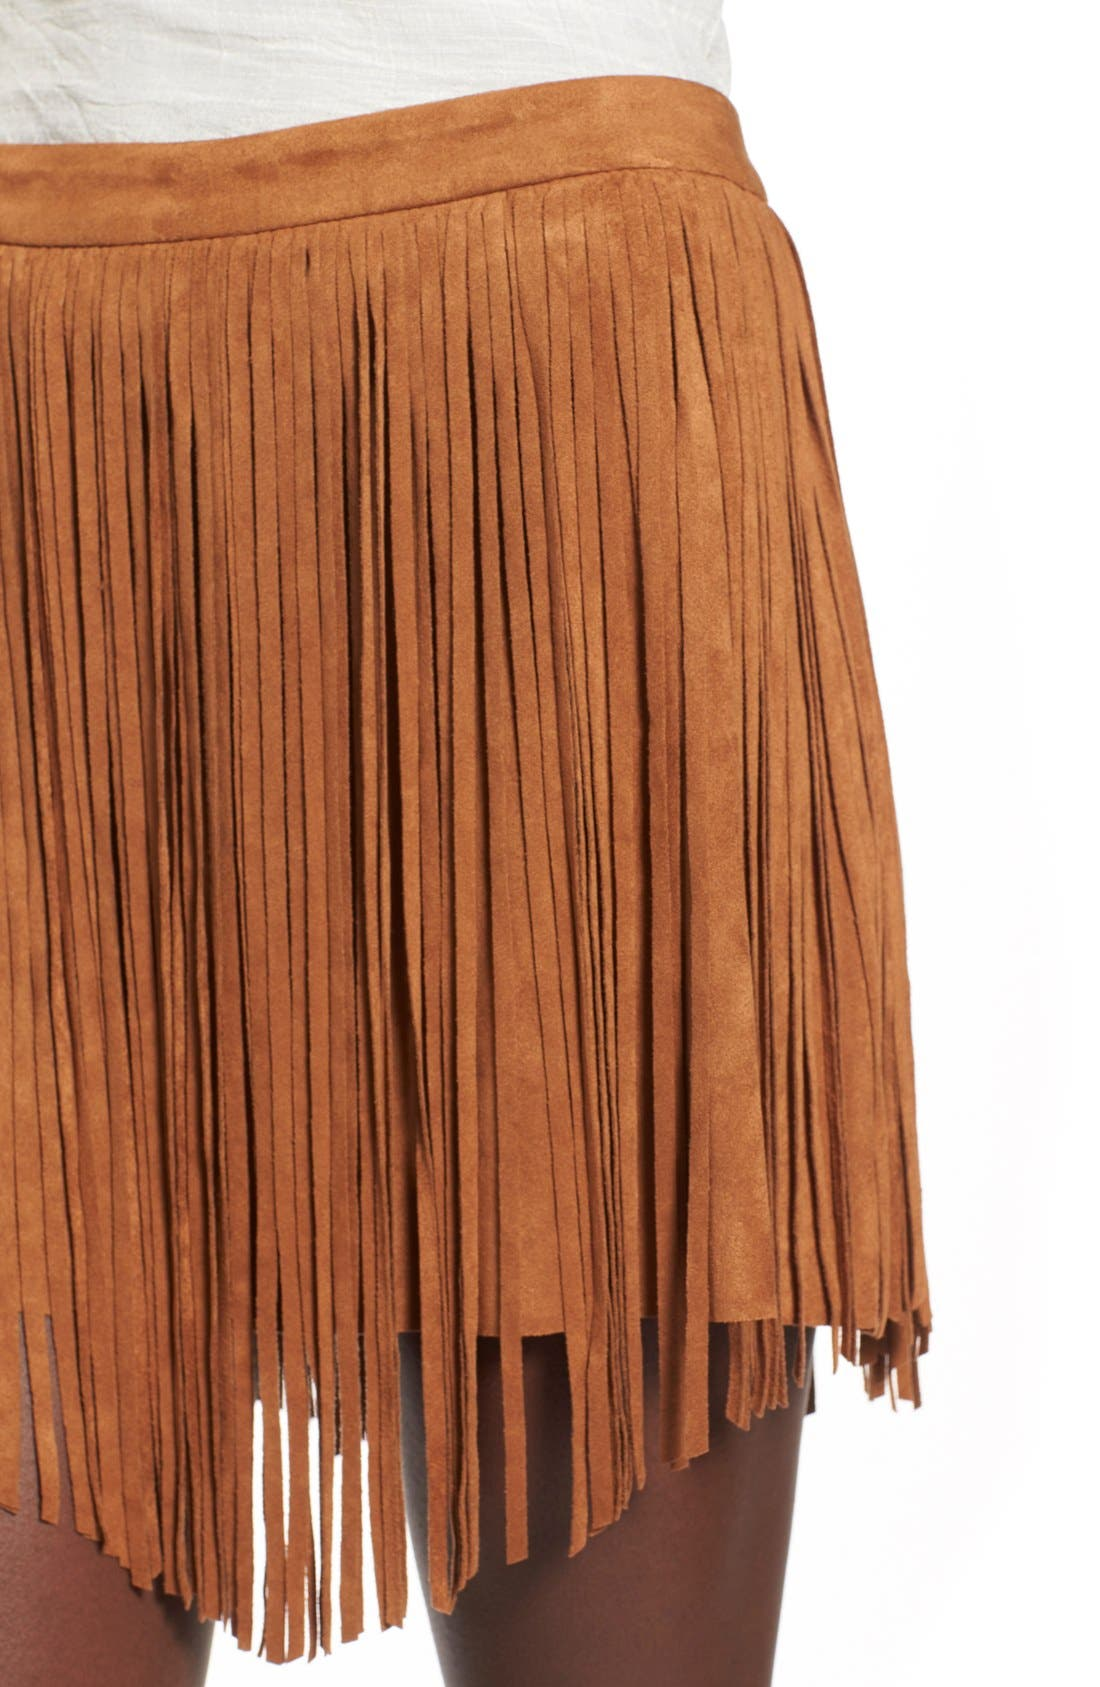 Fringe FauxSuede Skirt,                             Alternate thumbnail 4, color,